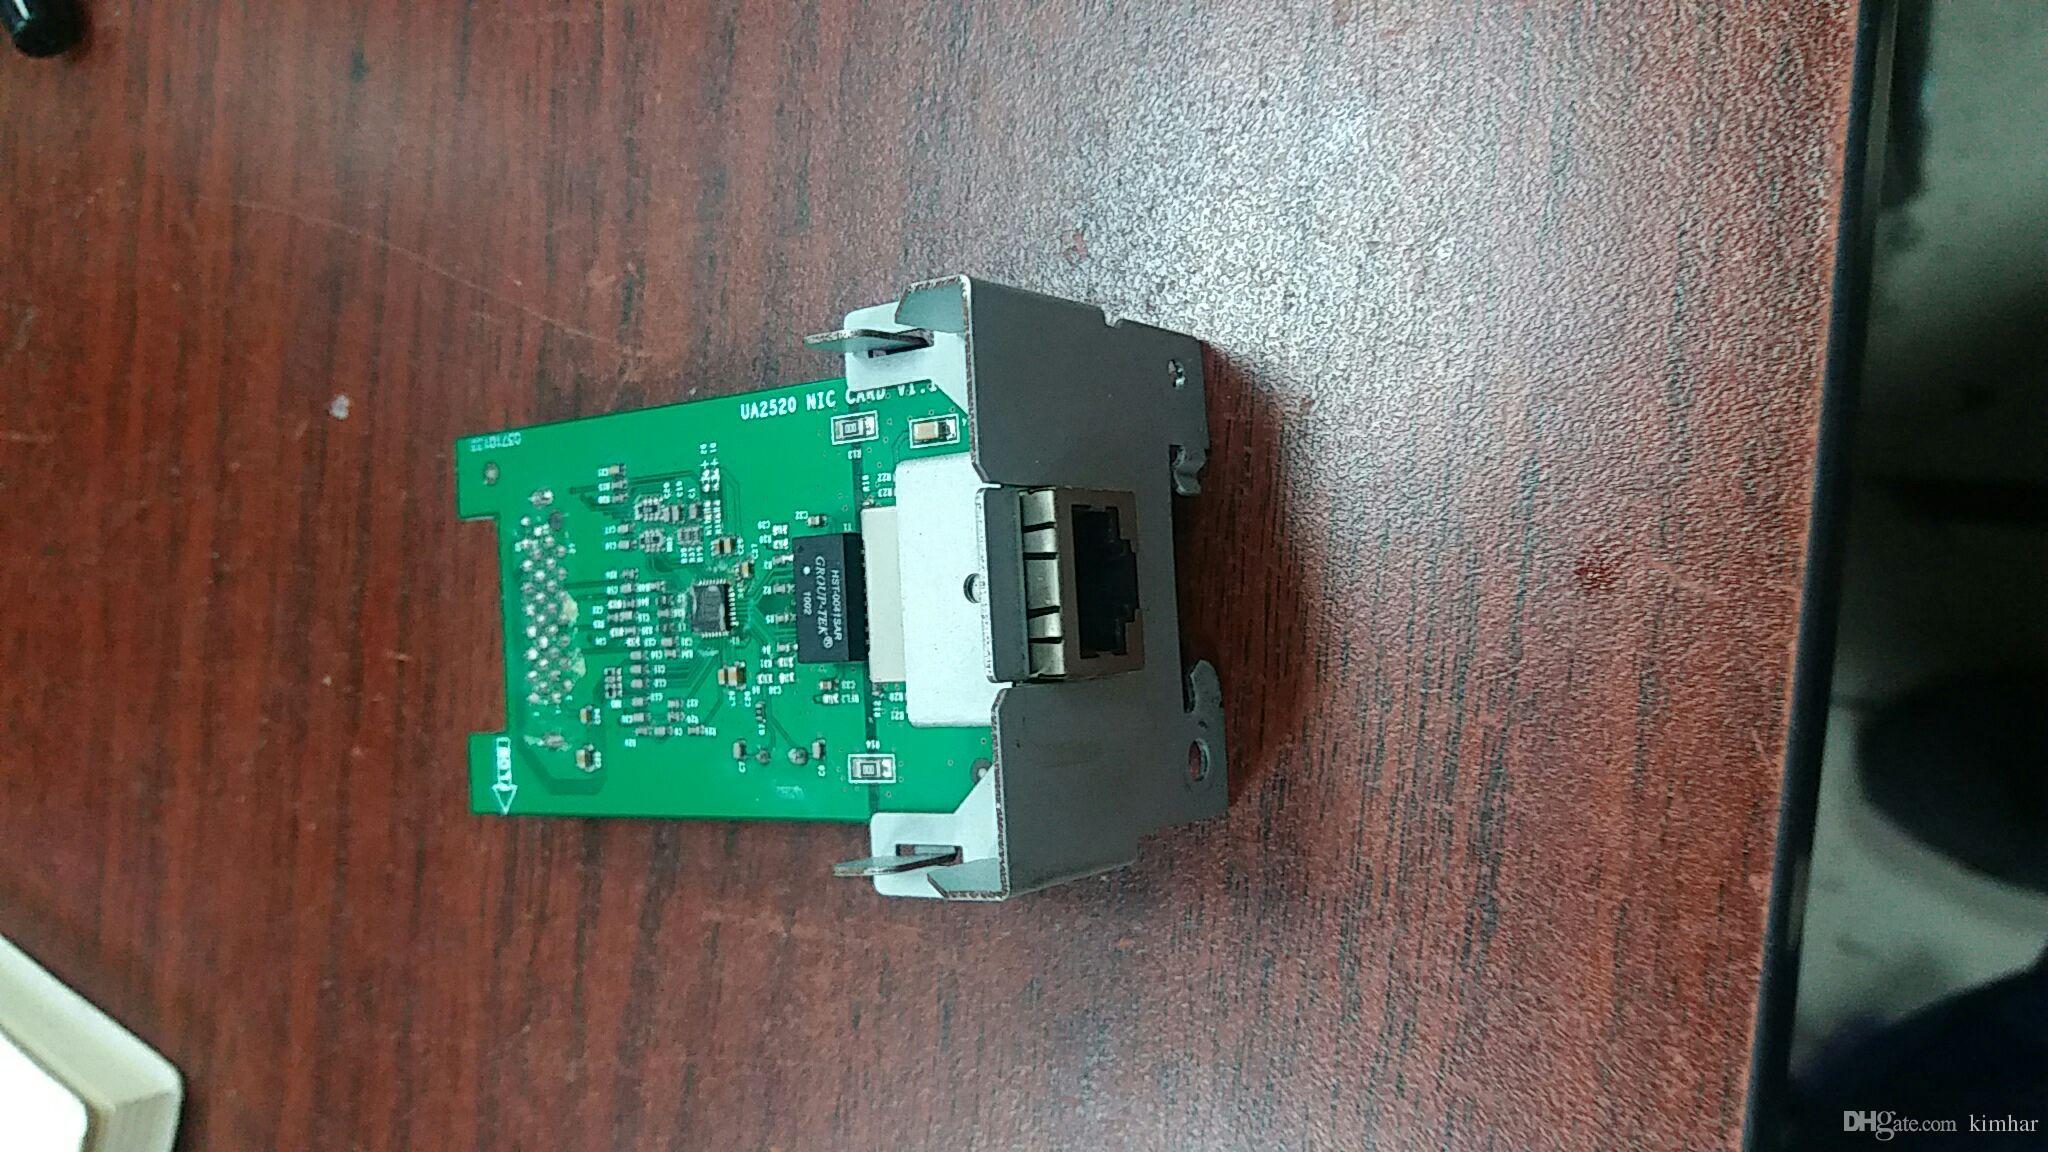 2018 for printer network card for canon ir2318l ir2320 ir 2320 2420 rh dhgate com RJ45 LAN Network RJ45 Wiring